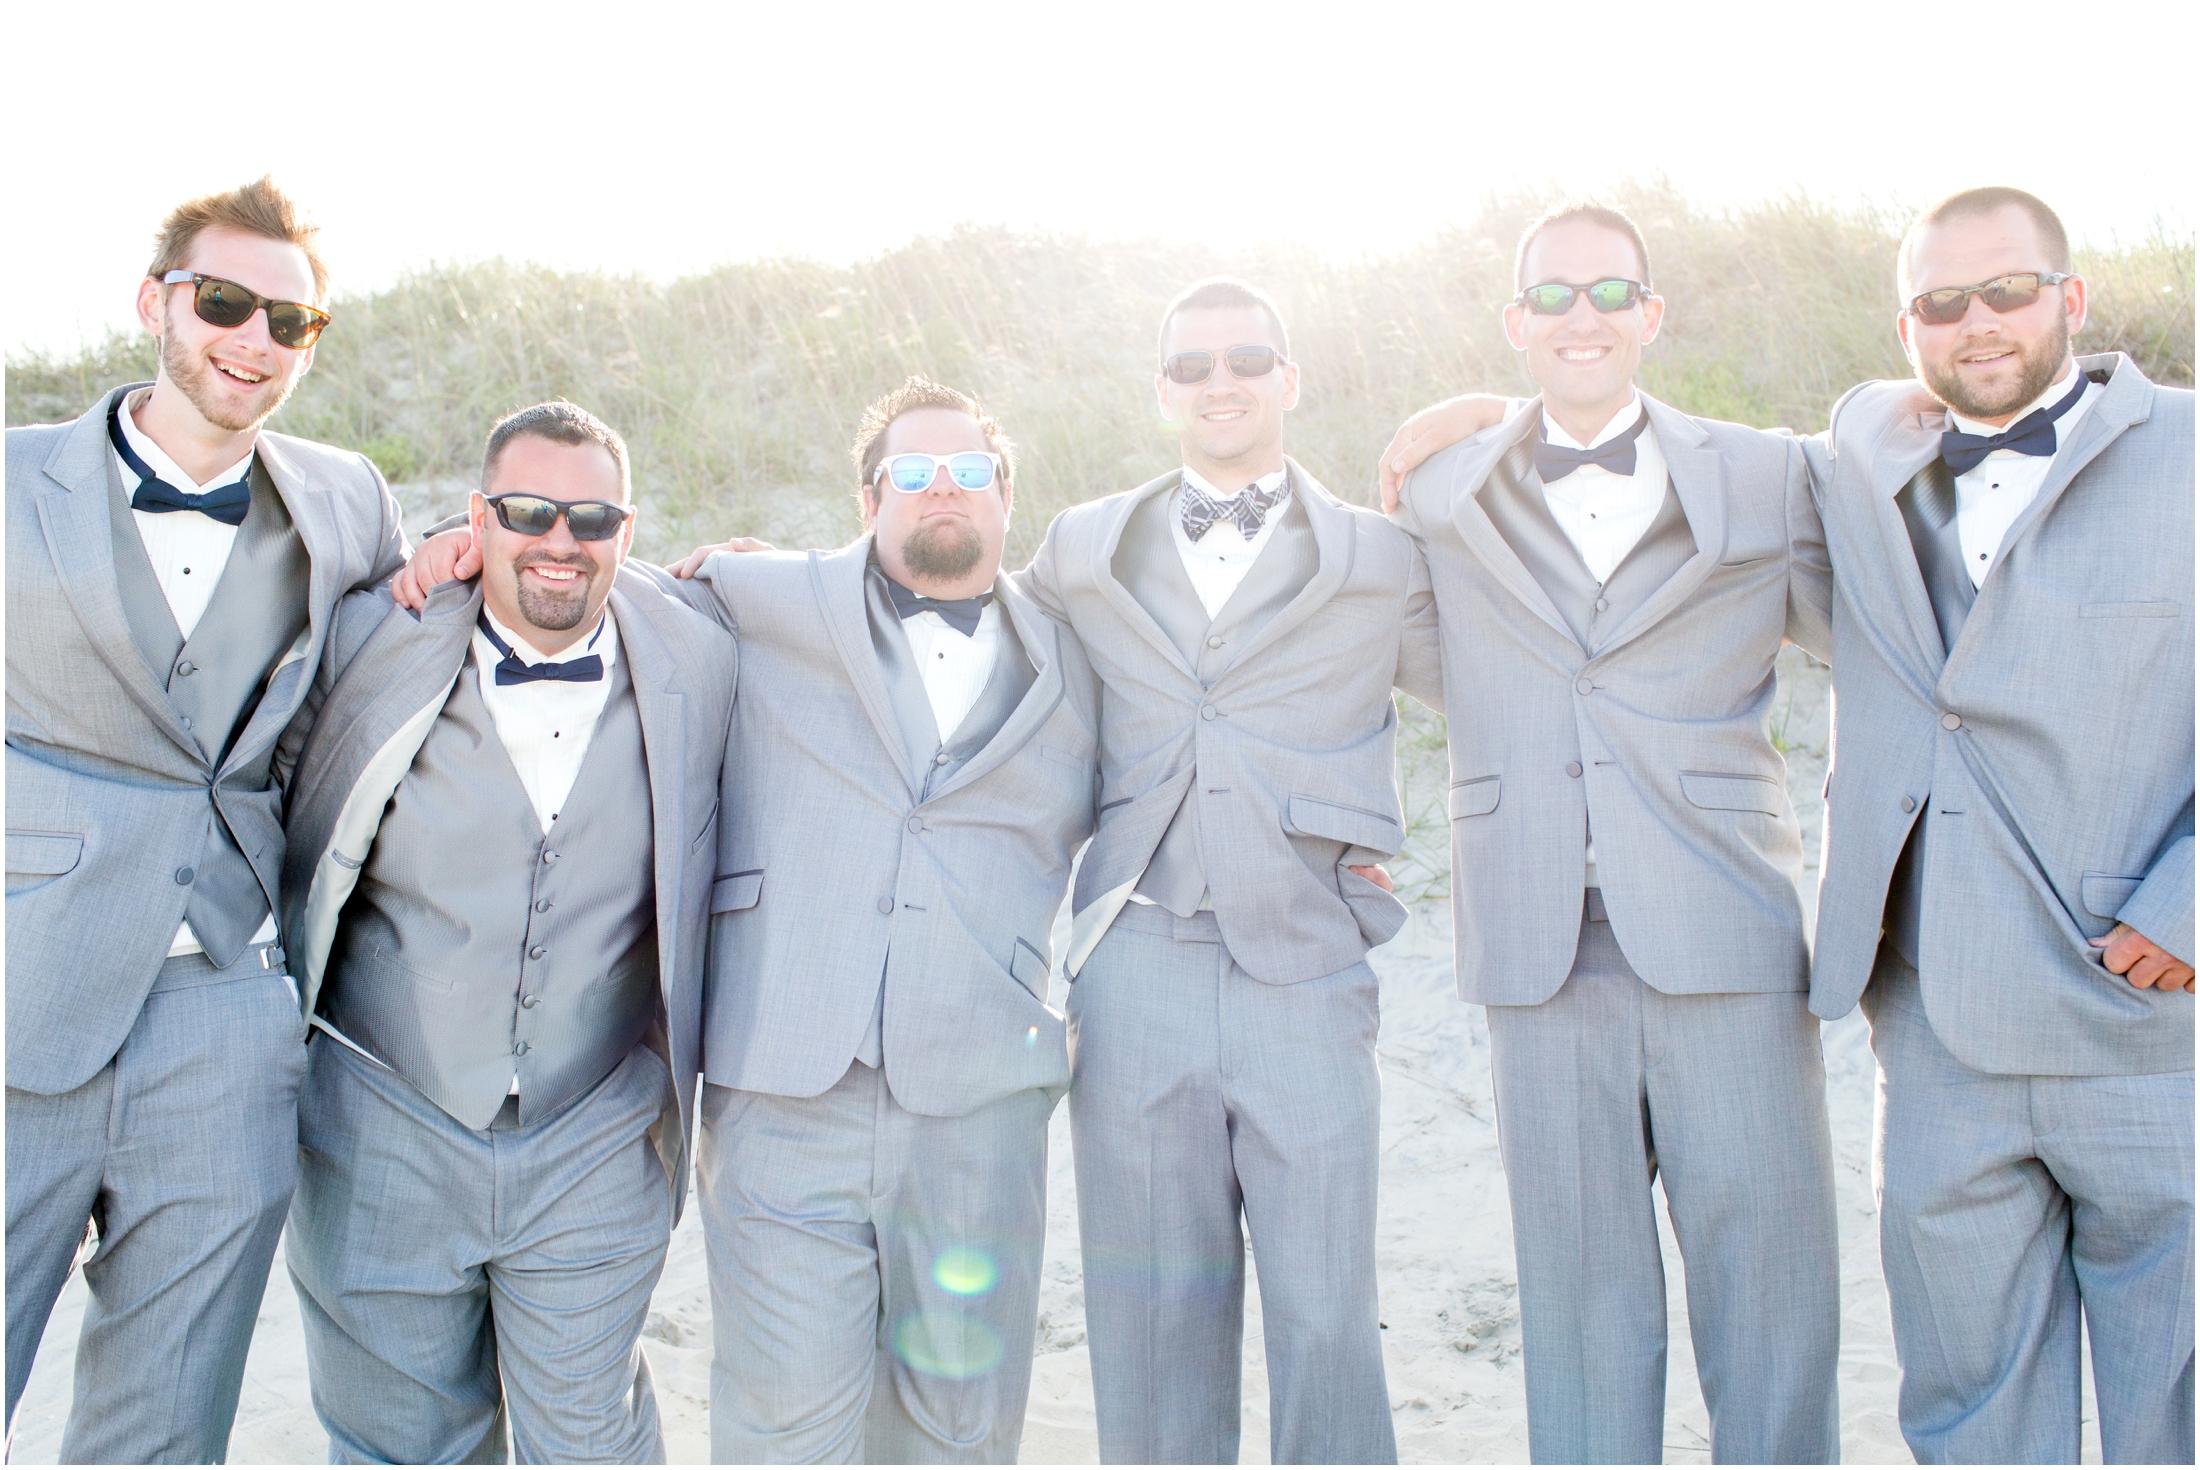 Pearce-Wedding-Bridal-Party-640.jpg